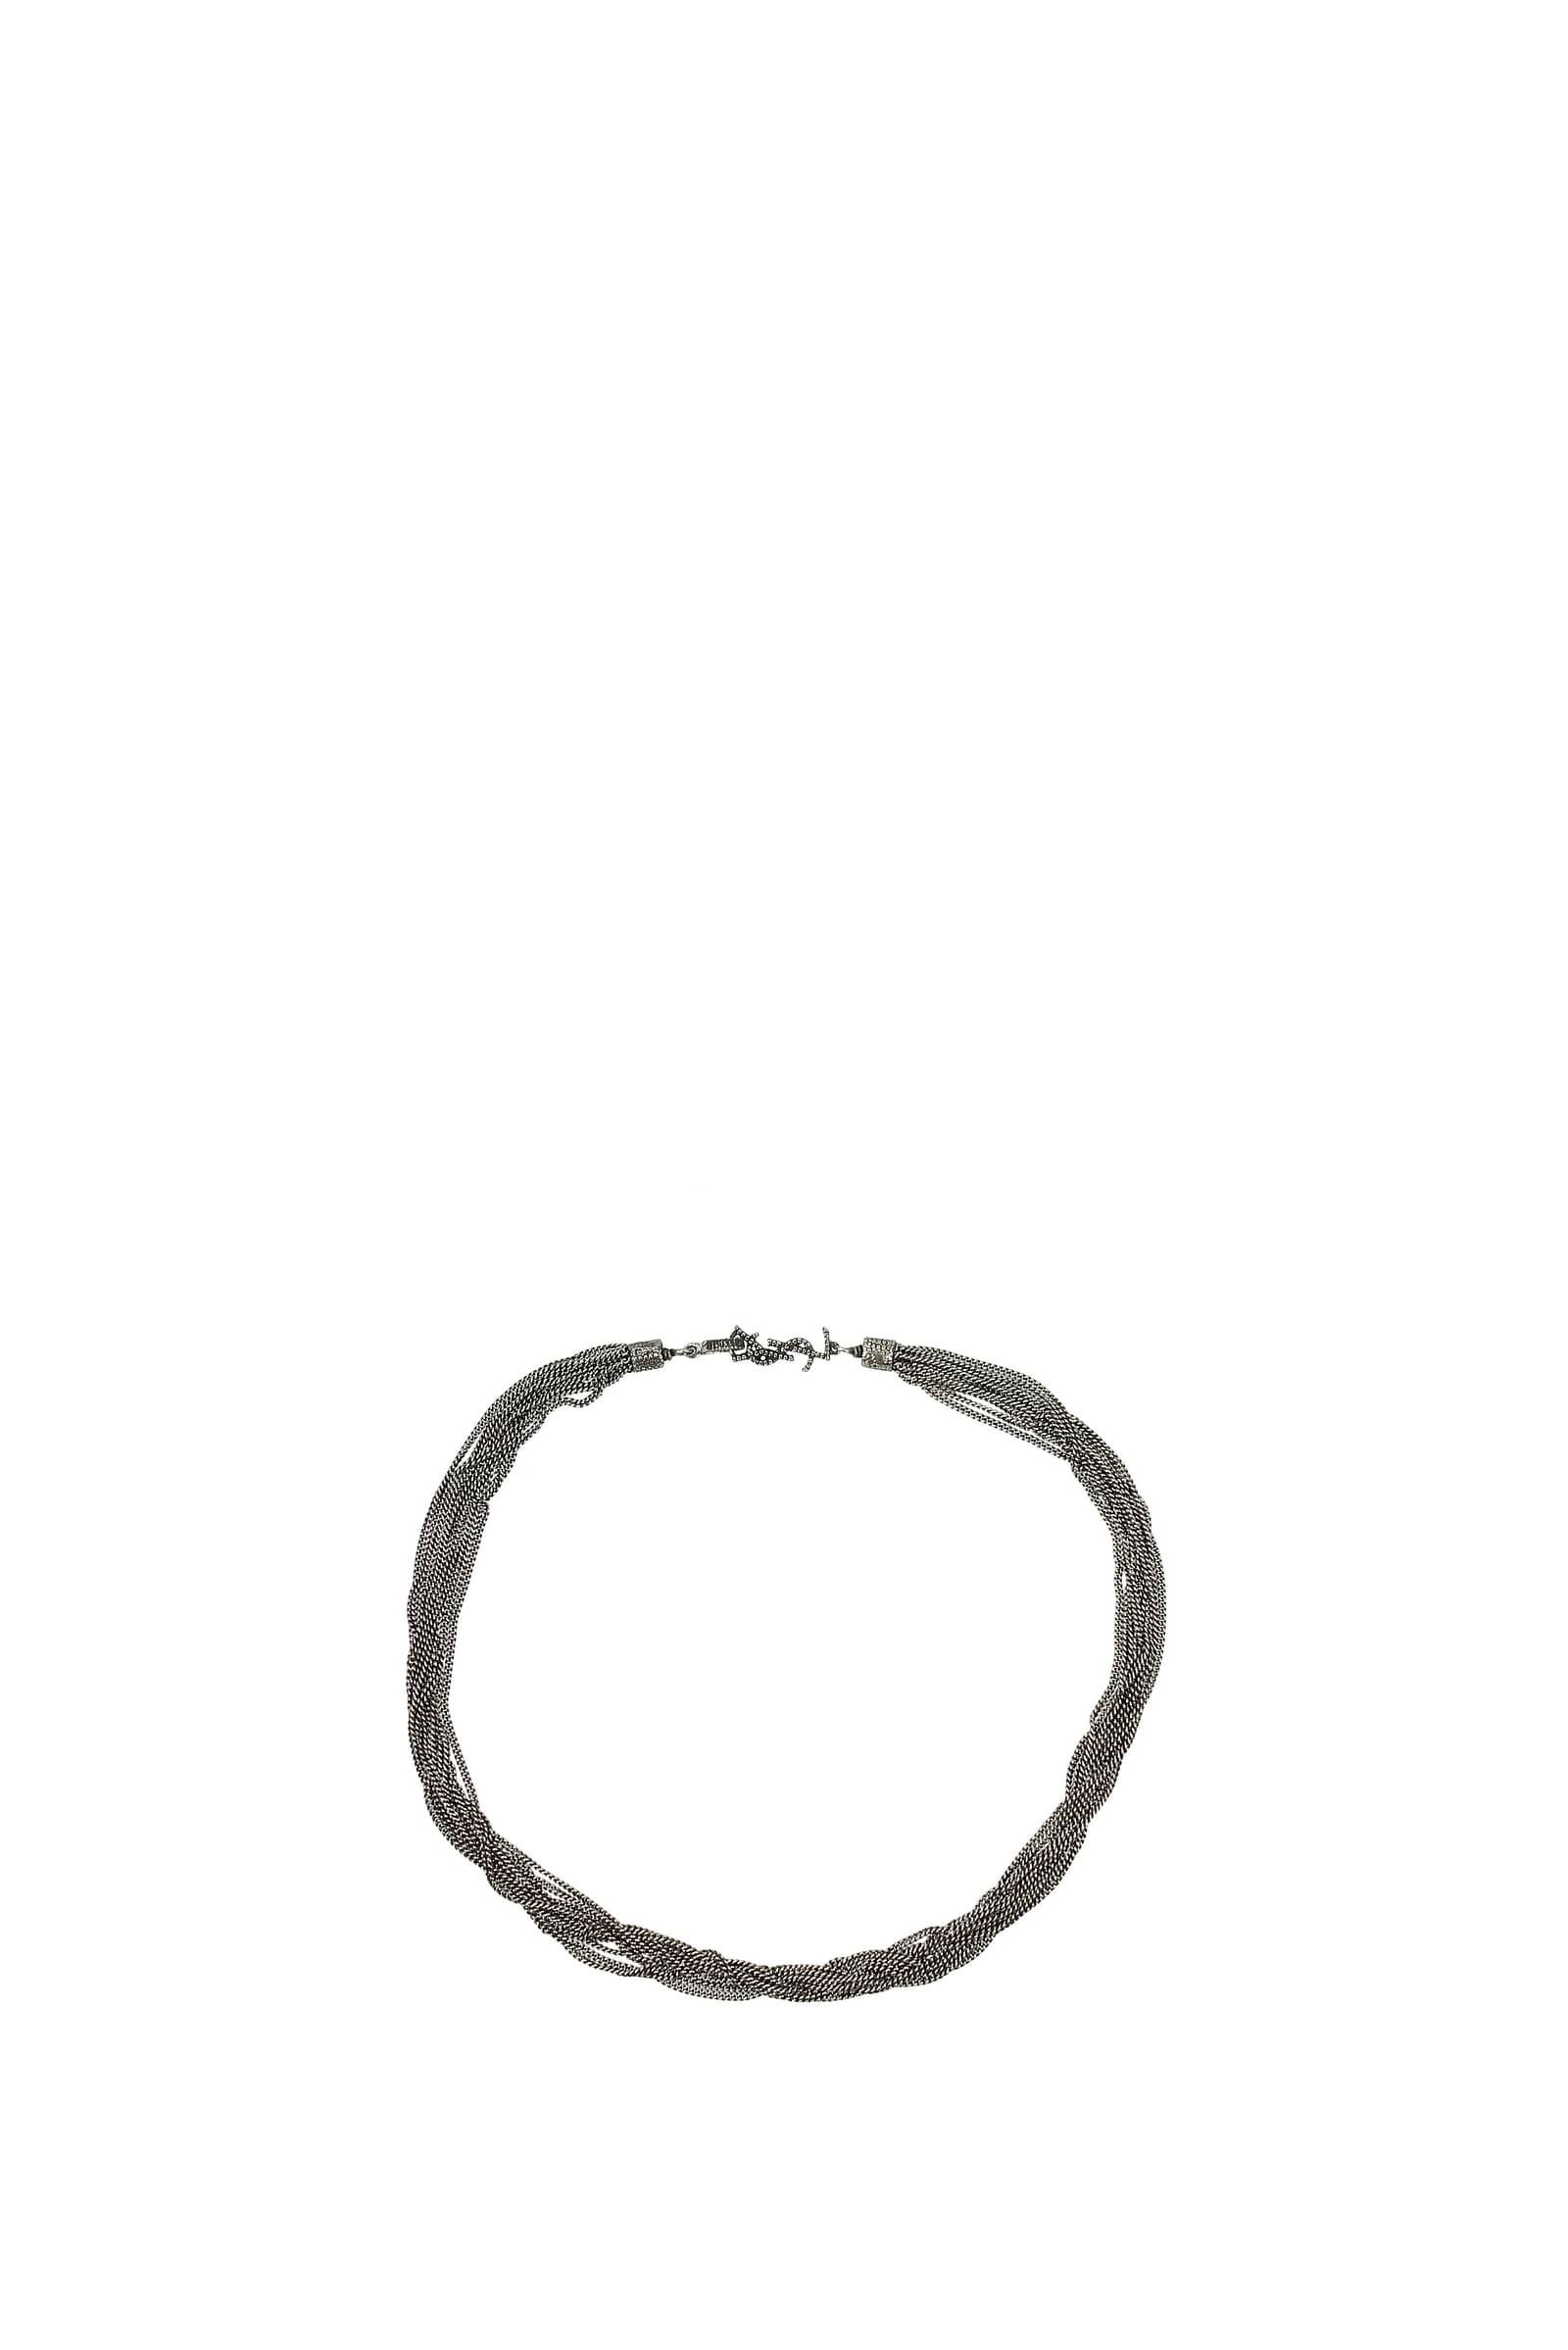 Collane-Saint-Laurent-Donna-Metallo-506028Y1614 miniatura 2